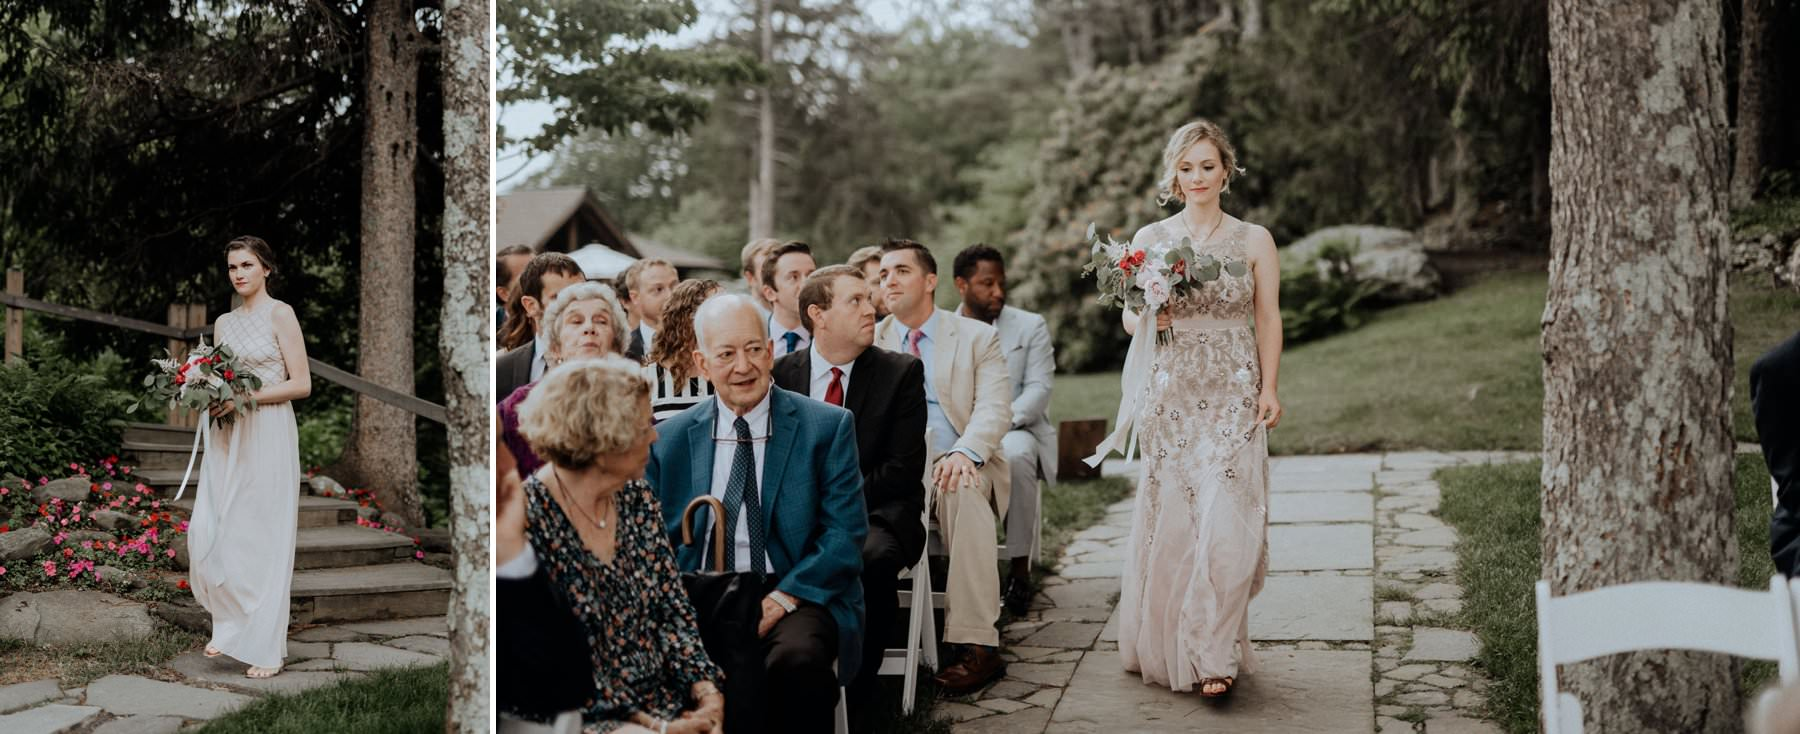 Onteora-Mountain-House-wedding-photographer-85.jpg